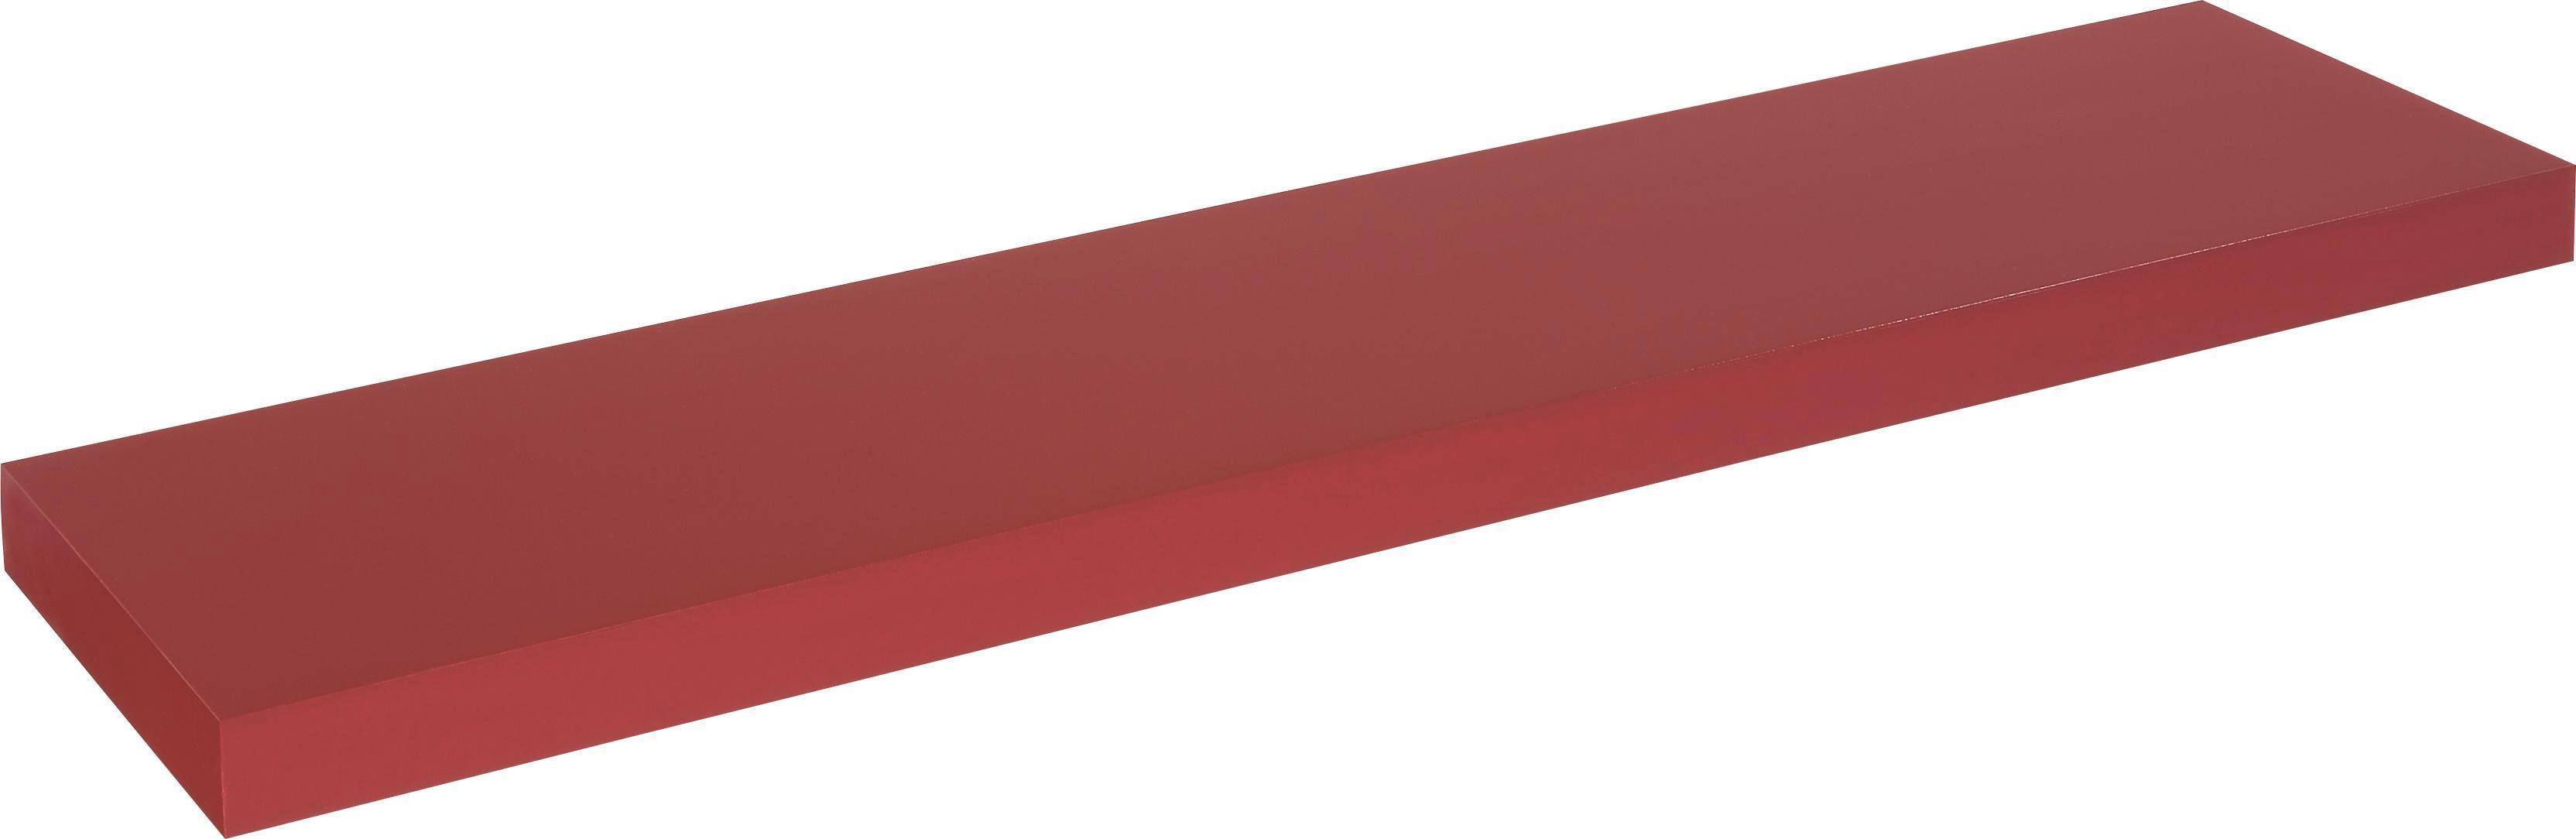 Wandboard in Rot - Rot, Holzwerkstoff (100/4,5/24cm) - MÖMAX modern living